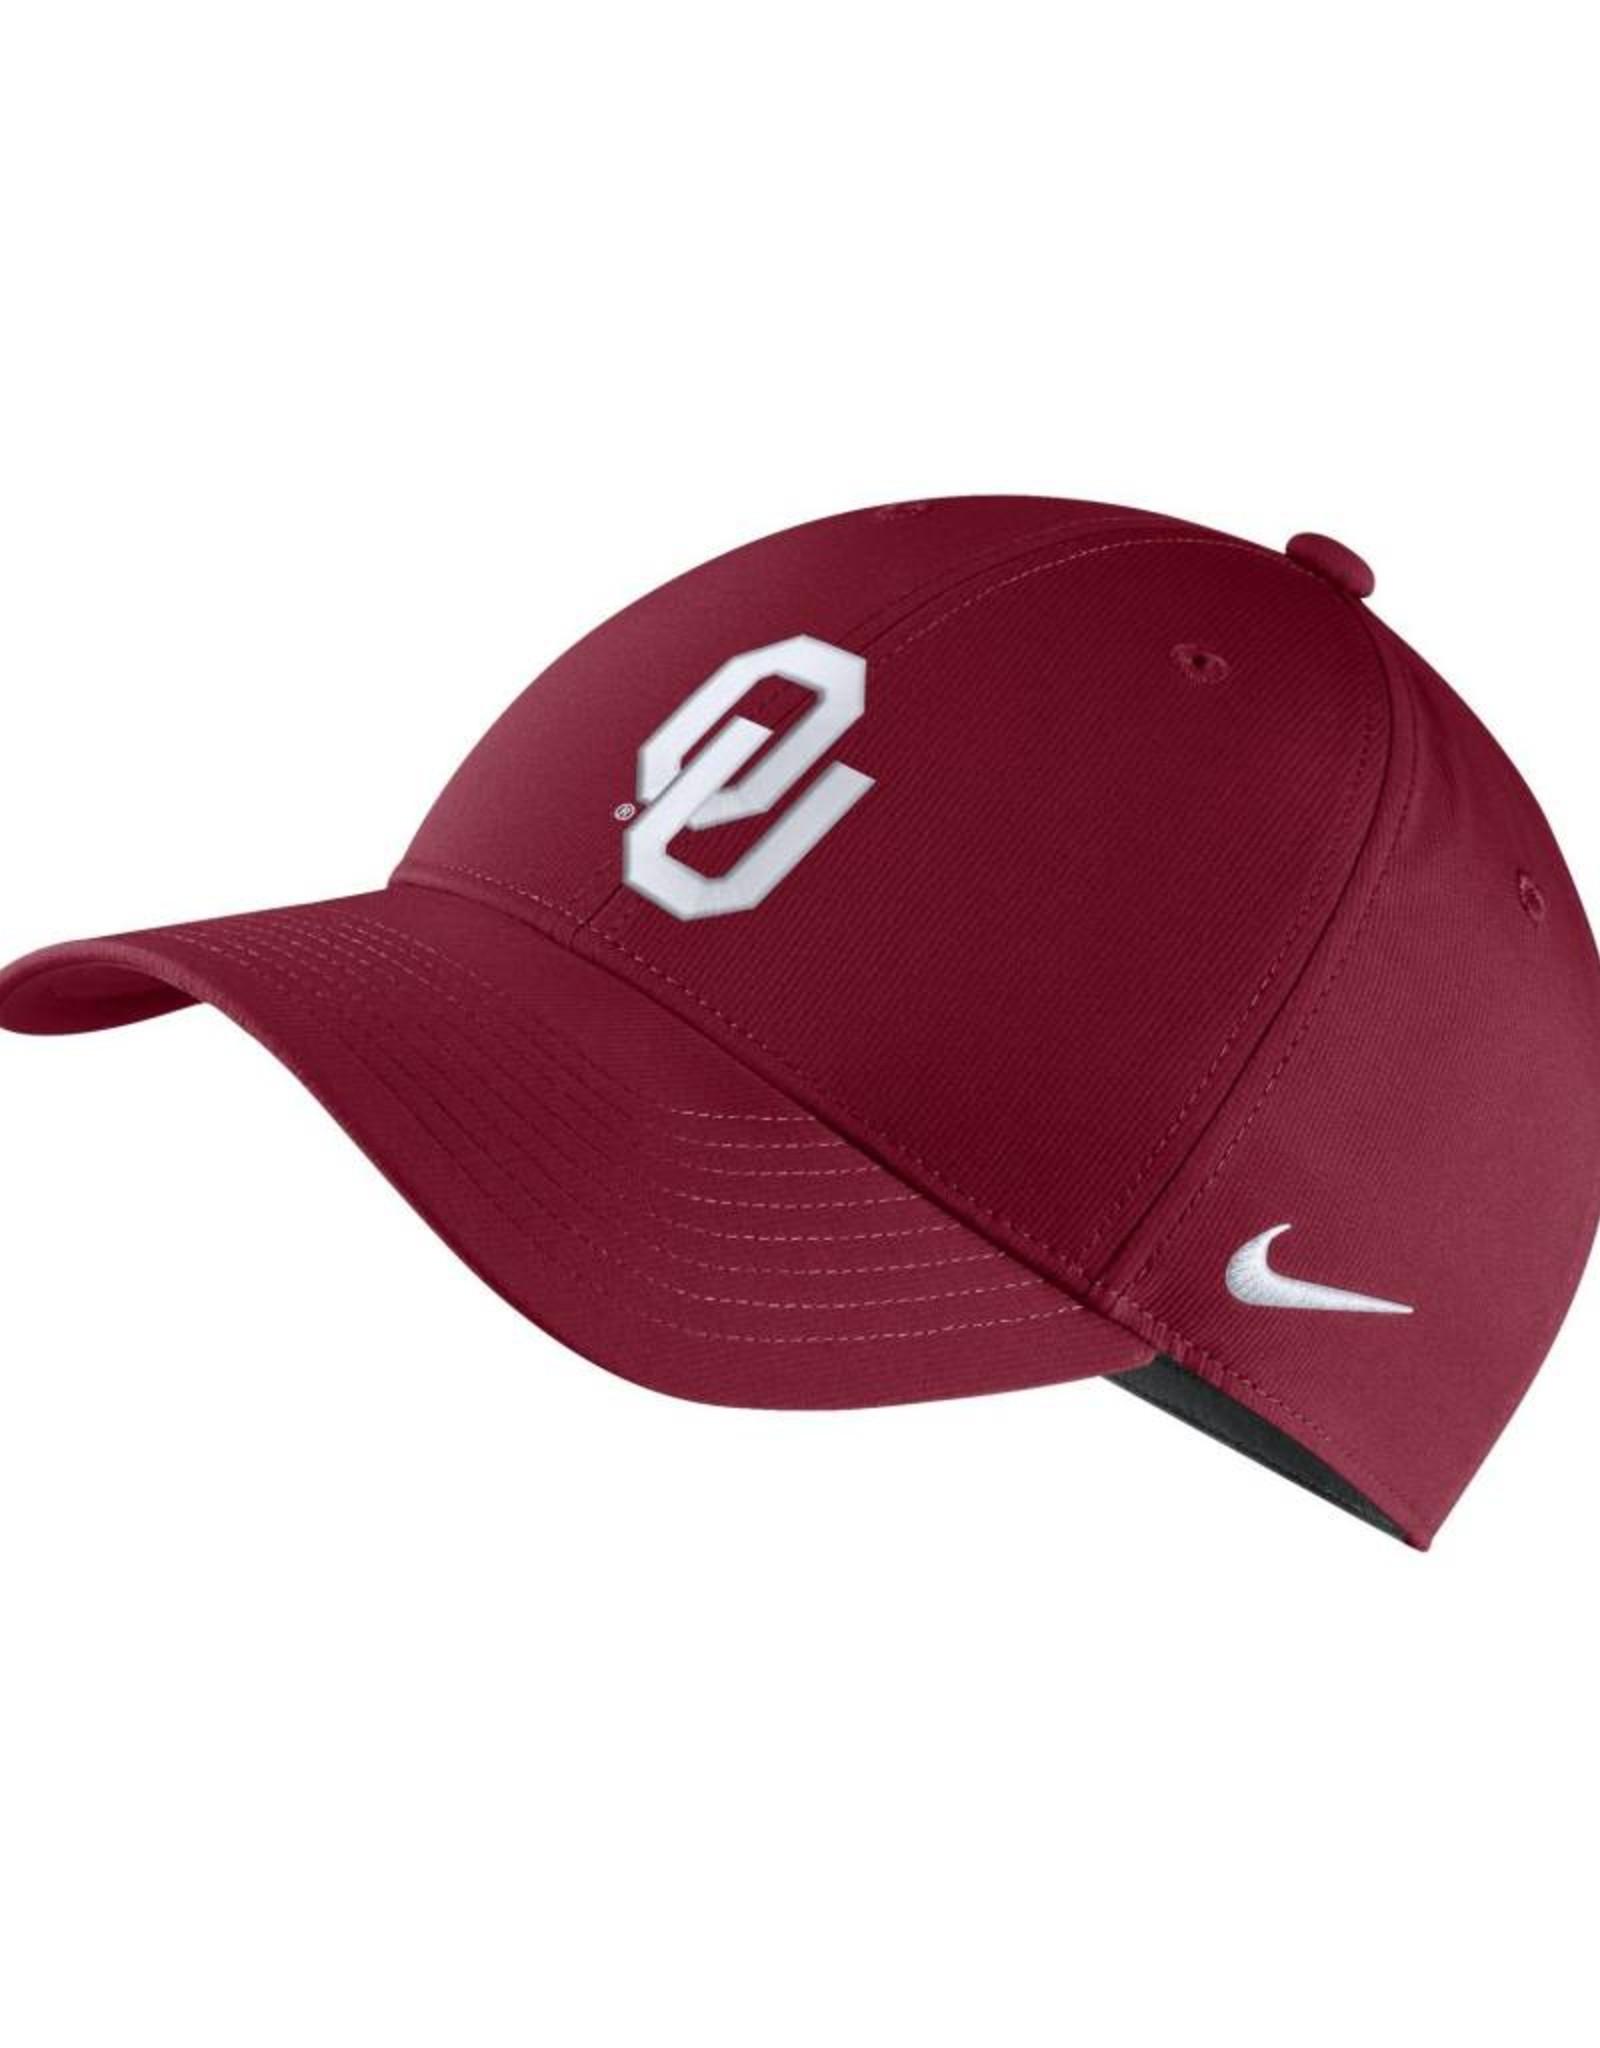 Nike Nike OU DriFIT Legacy91 Adjustable Hat in Crimson